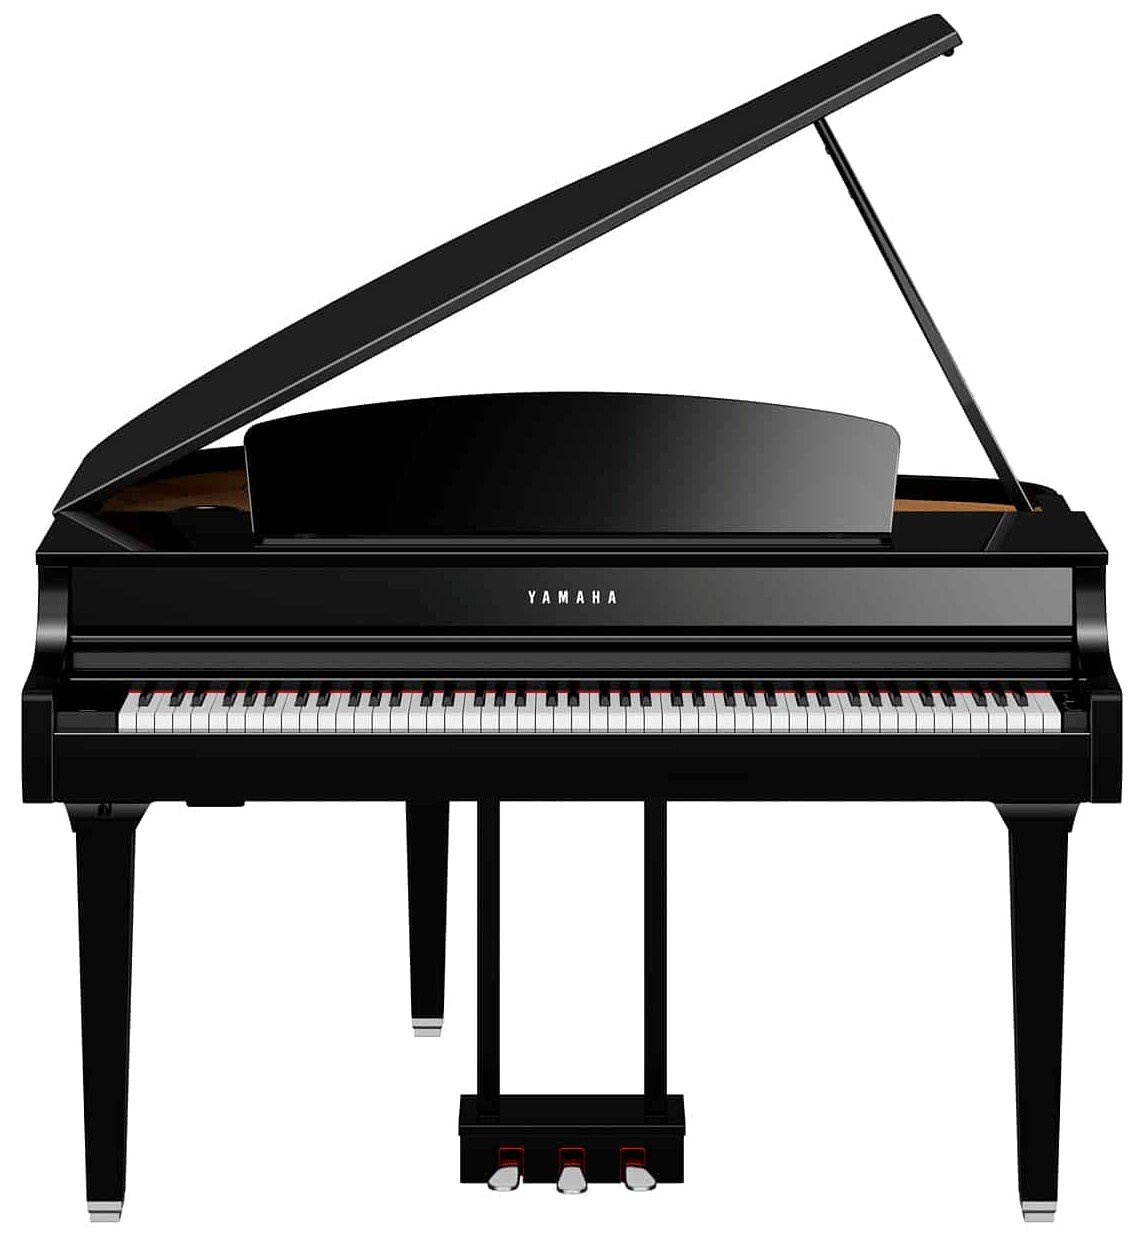 Yamaha CLP-795 digital piano